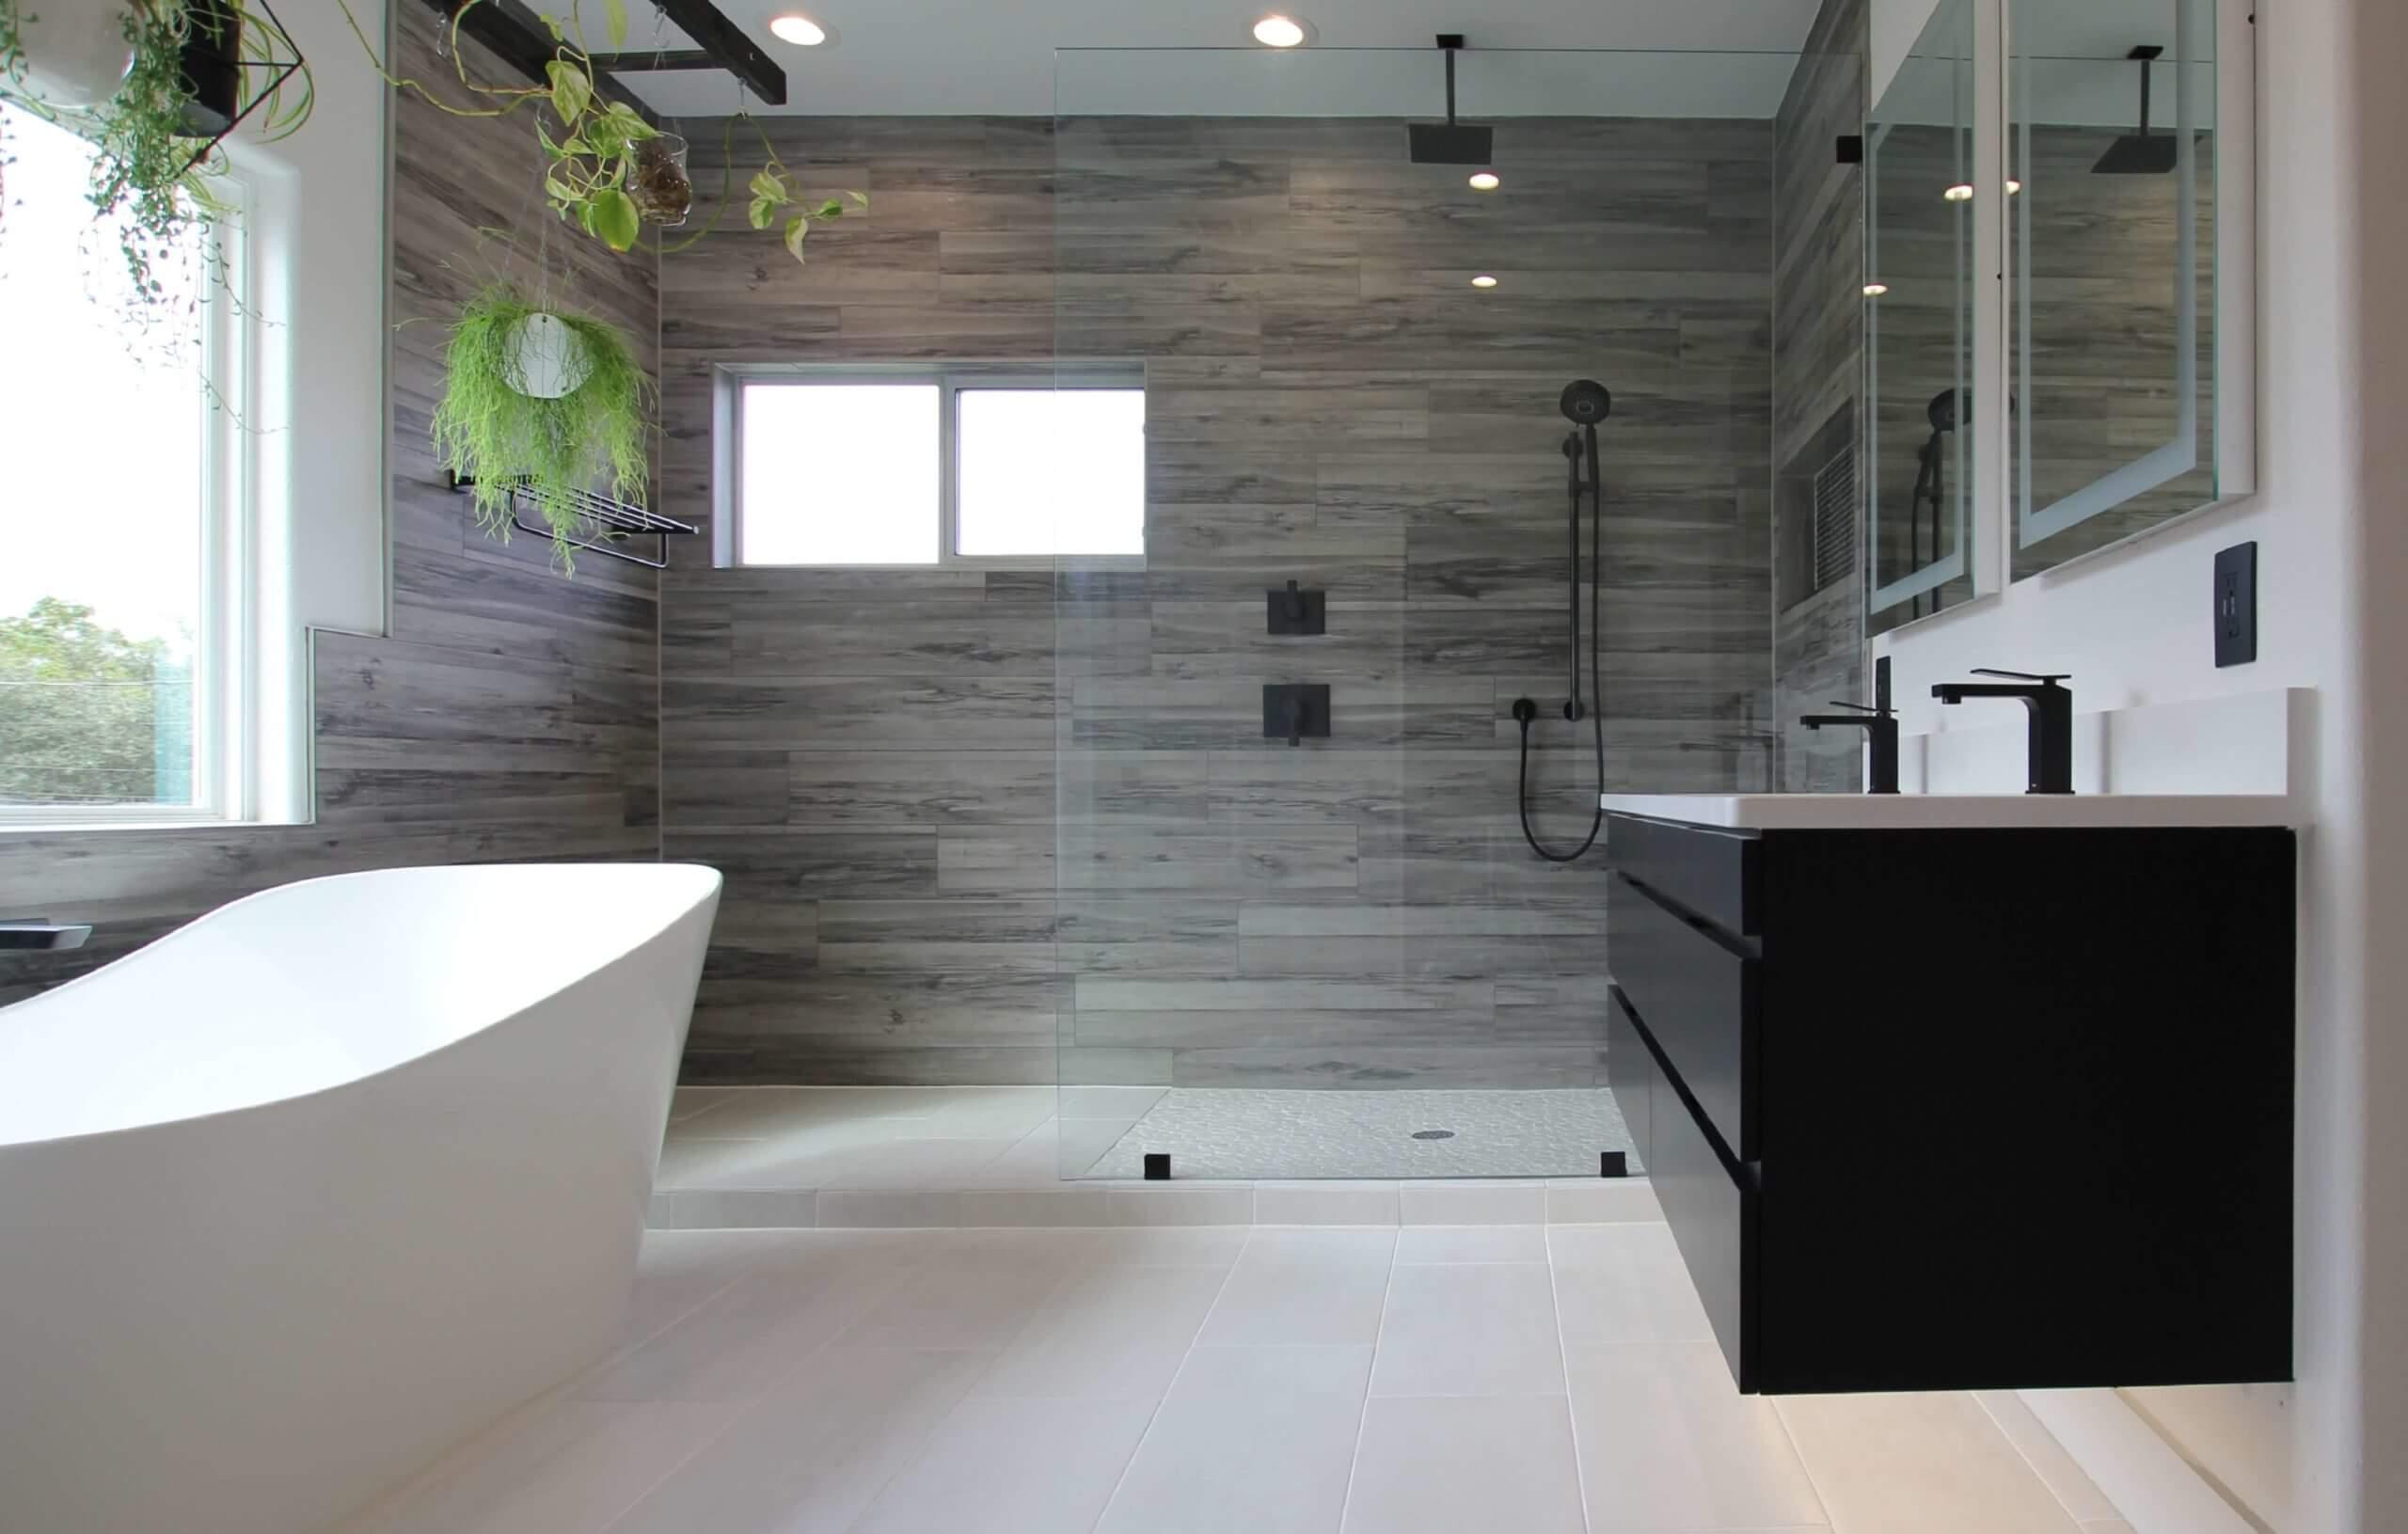 NARI CotY award winning design-build bathroom remodel